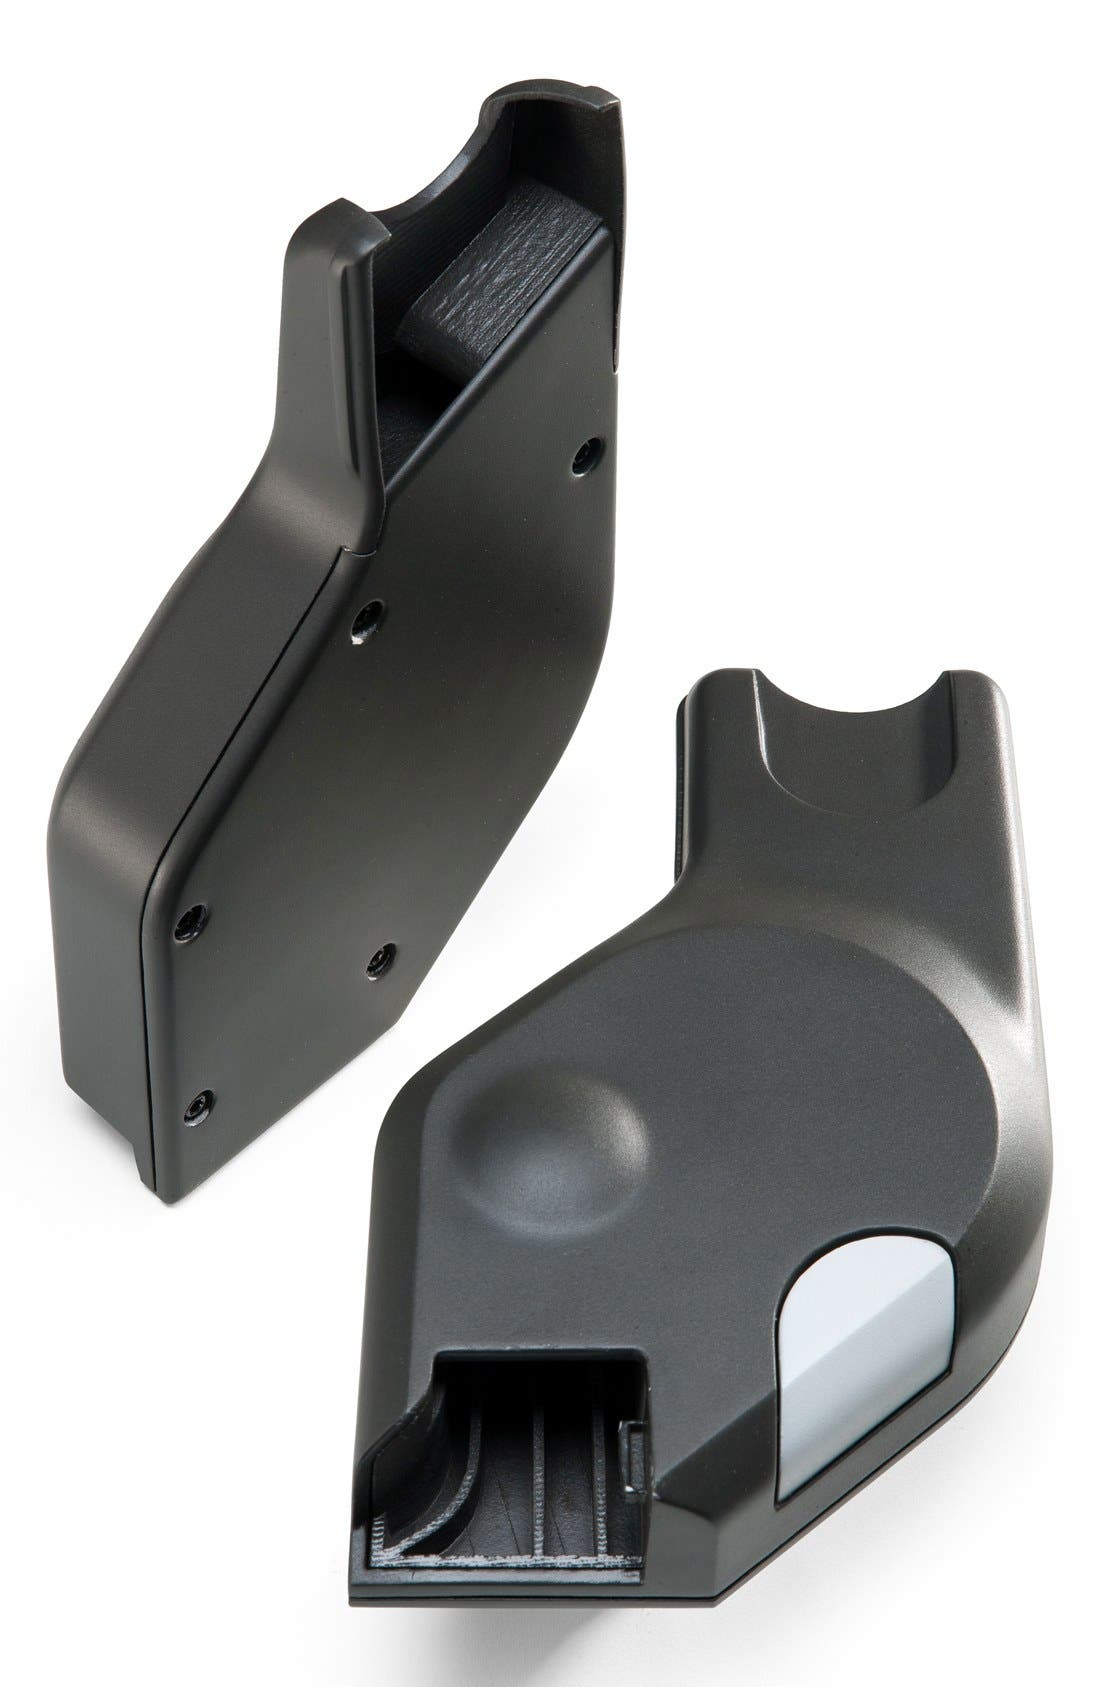 Main Image - Stokke 'Xplory®' & Stokke 'Scoot' Car Seat Adaptor for Maxi Cosi & Nuna